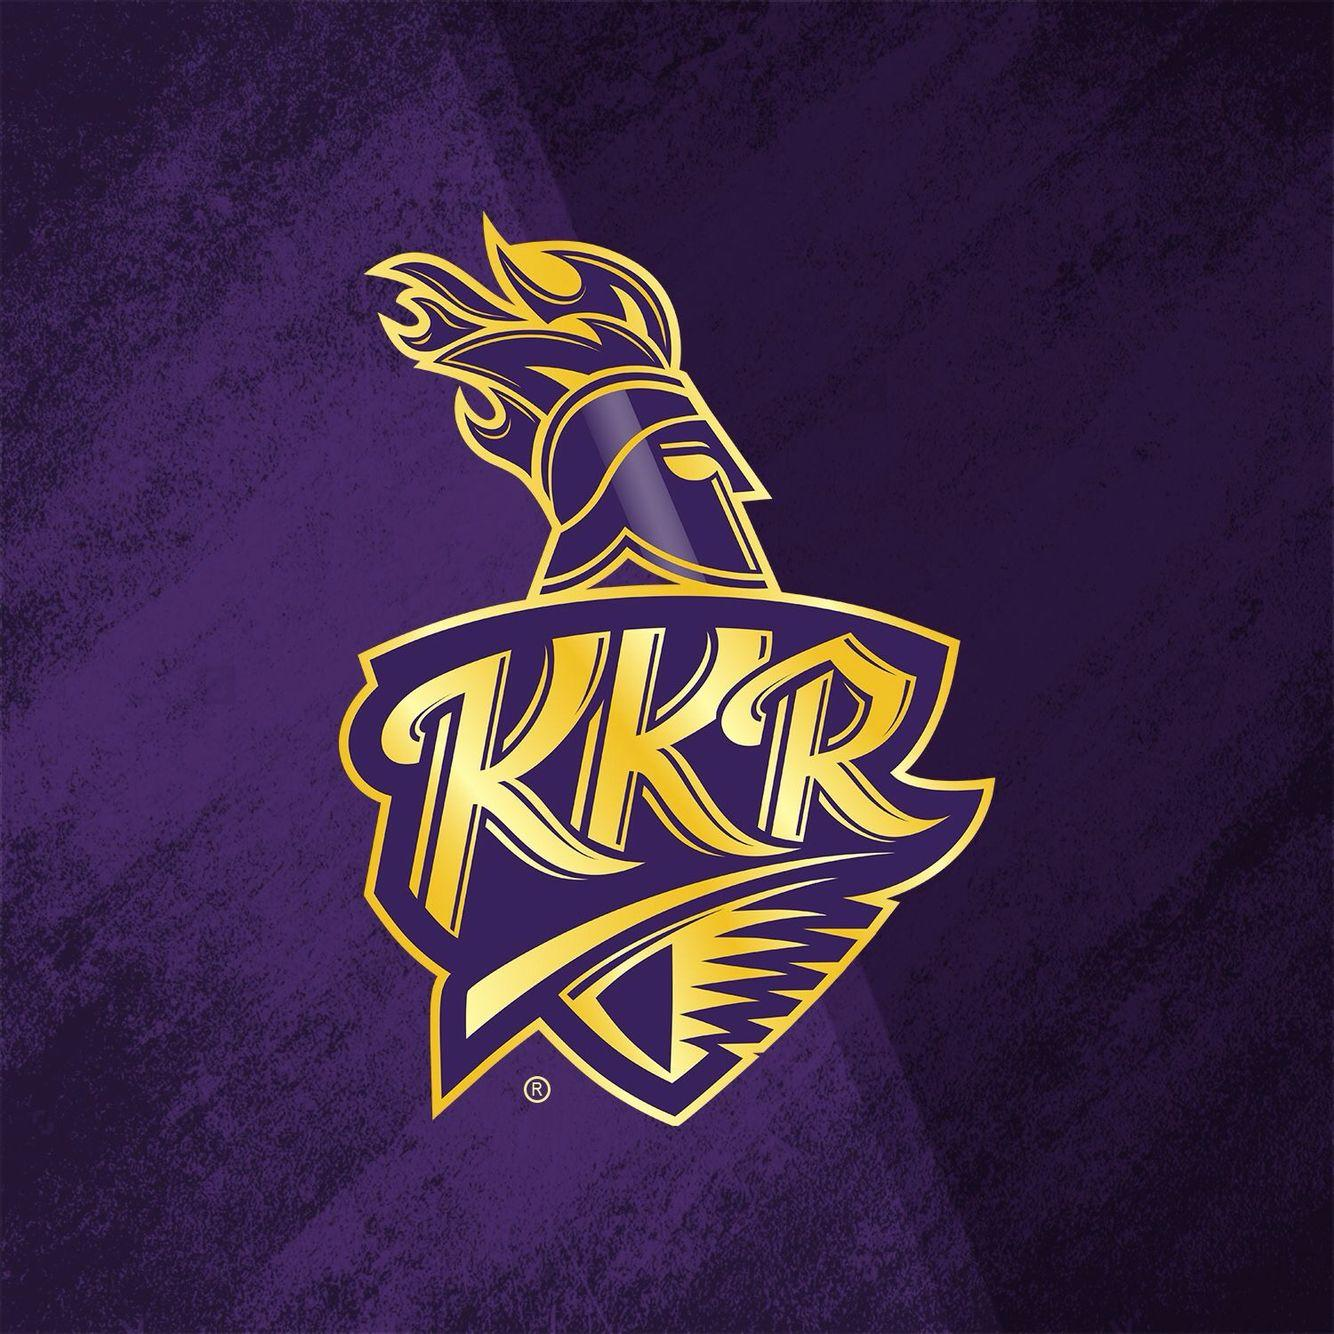 KKR IPL Wallpapers - Wallpaper Cave